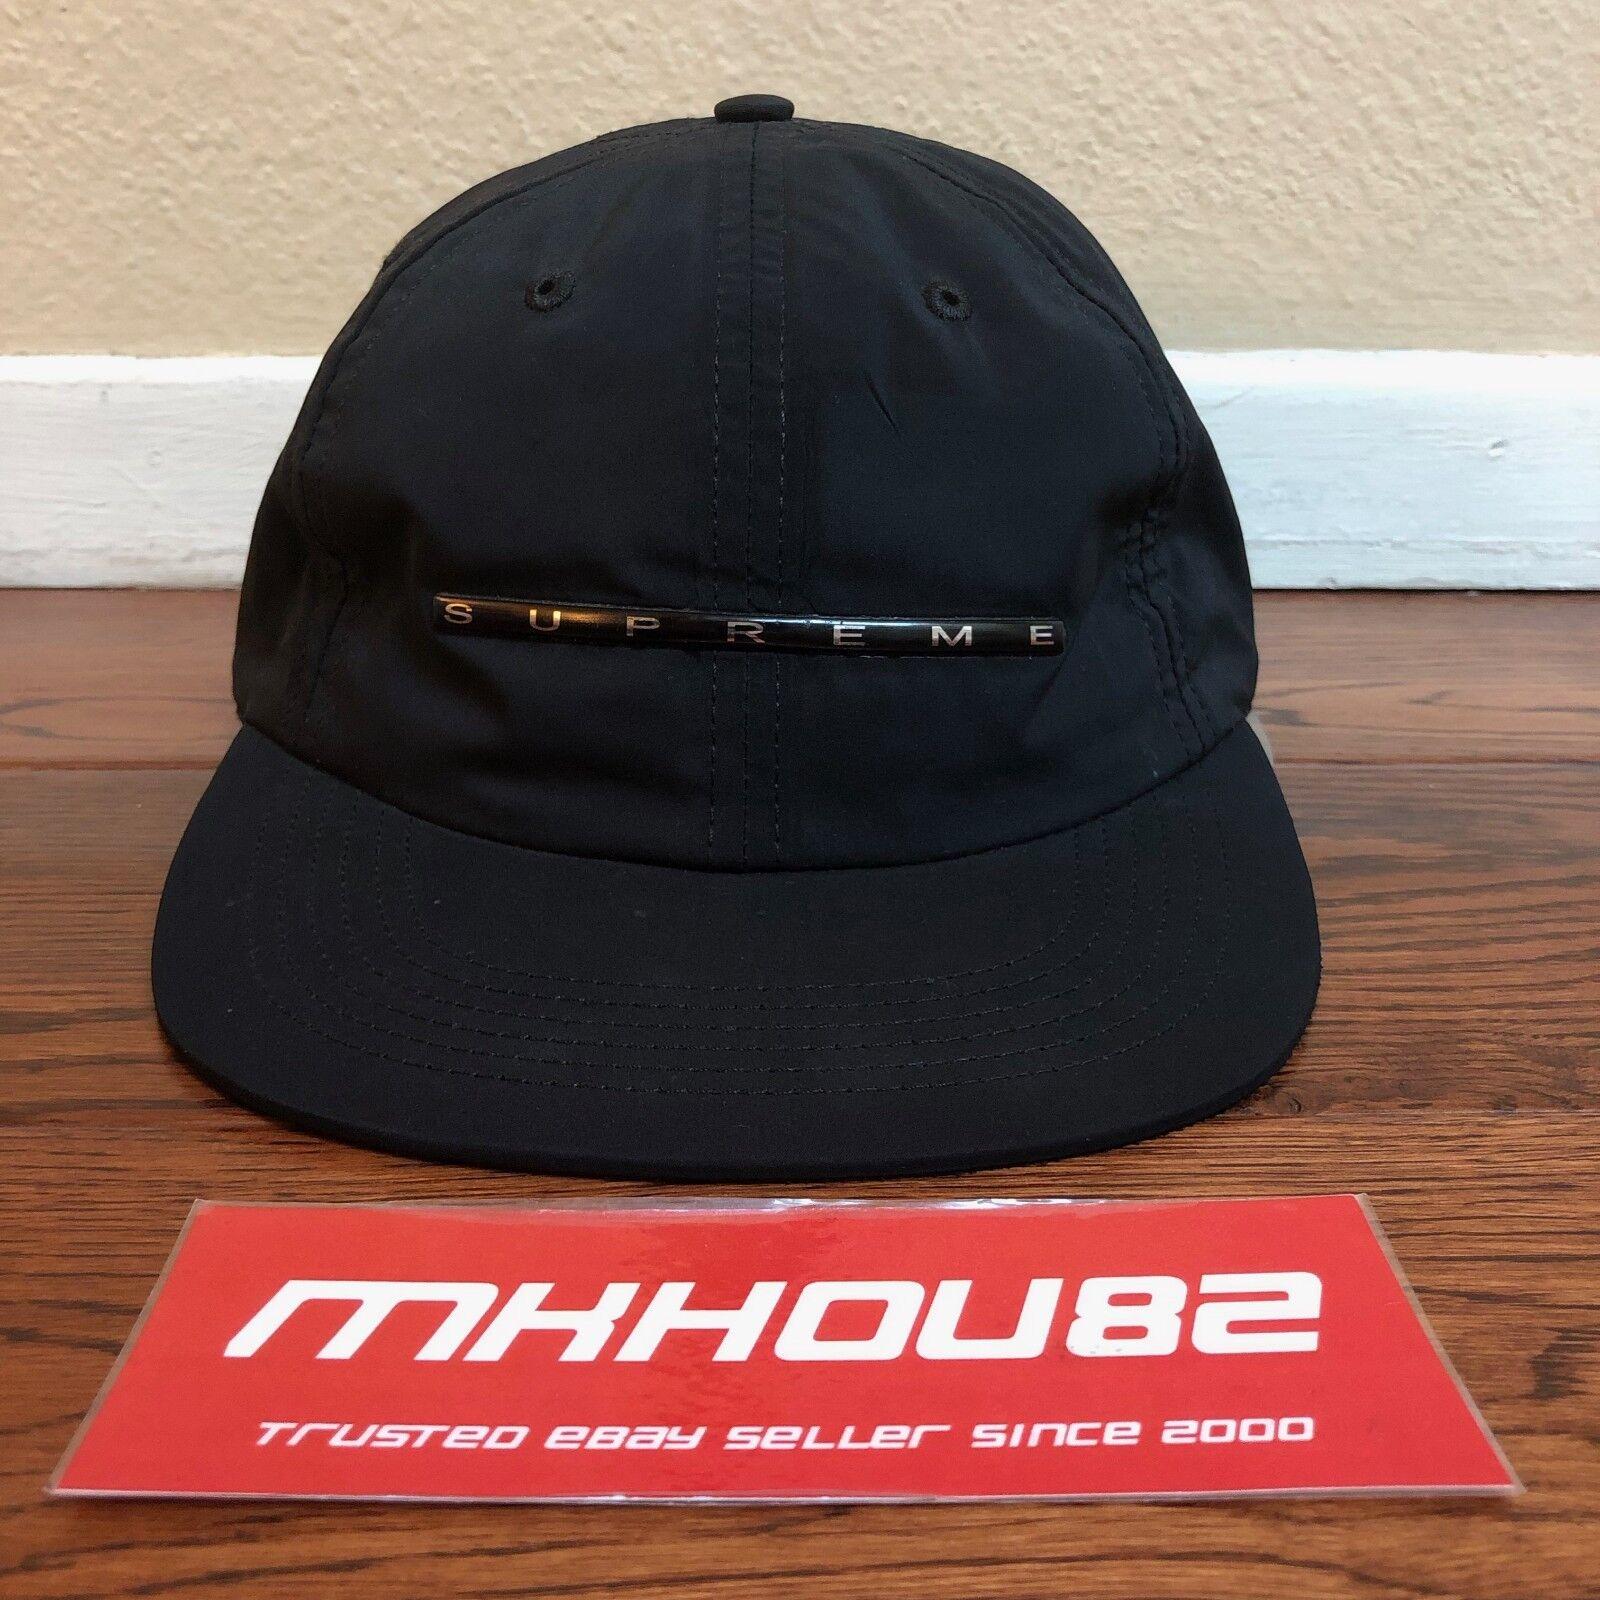 c4eec85b997 Buy supreme overlap panel cap hat black camp spring summer jpg 1600x1600  Supreme baseball cap model